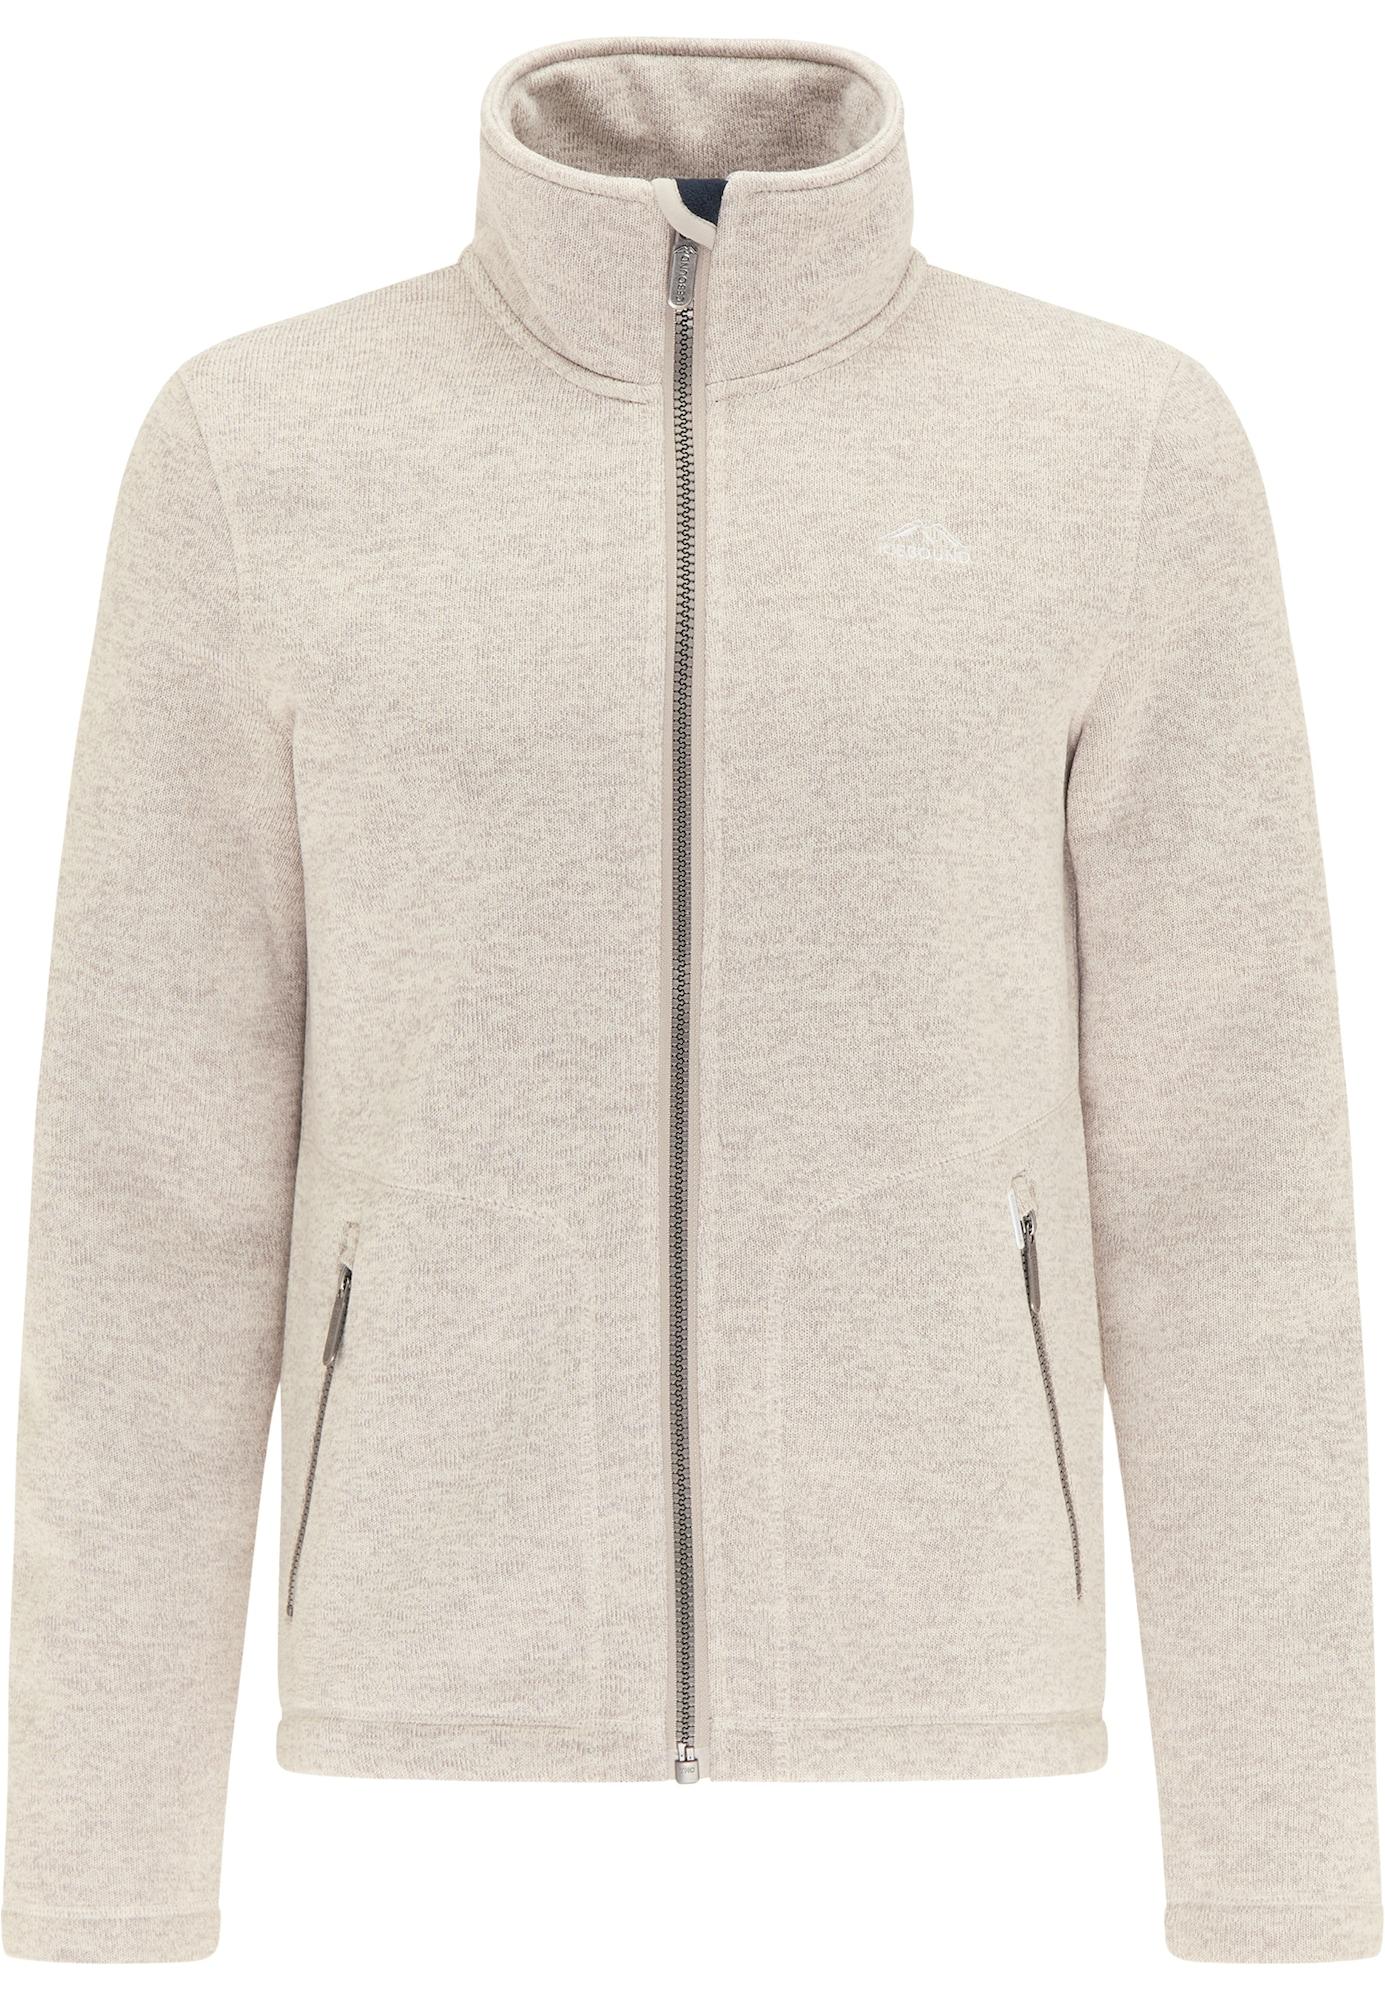 ICEBOUND Flisinis džemperis perlų balta